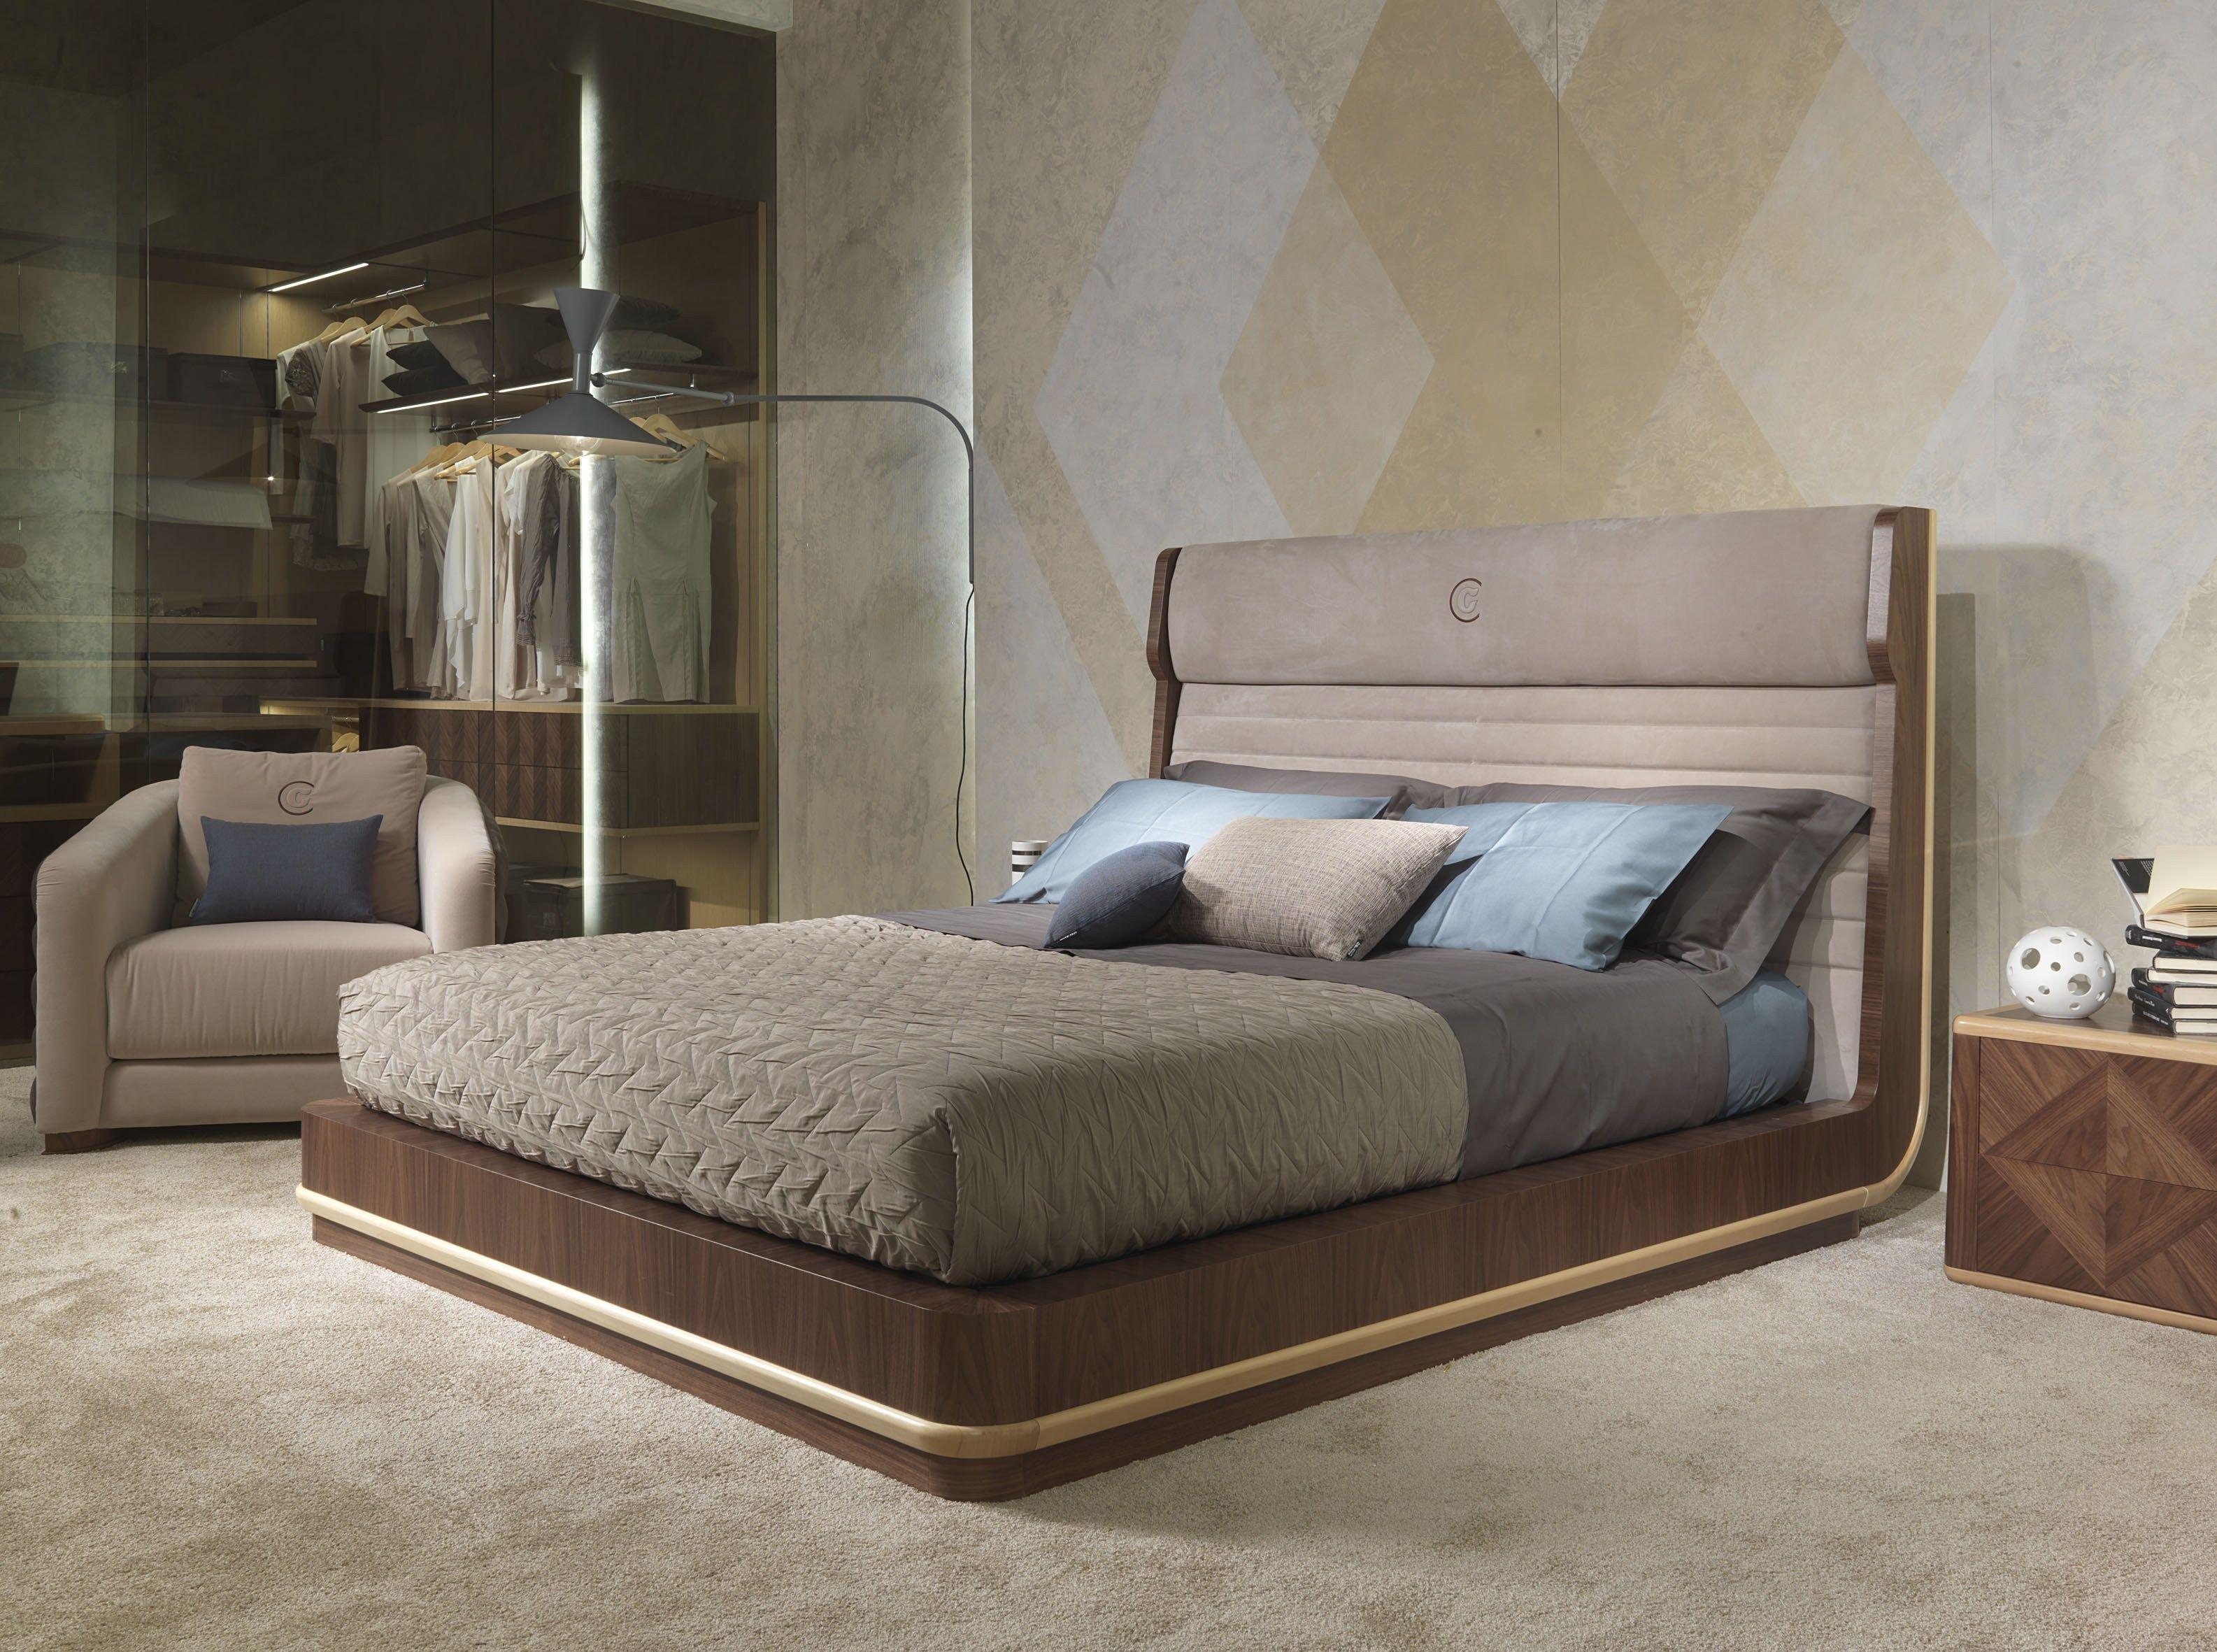 DESYO 床 by Carpanelli Contemporary | bed | Pinterest | Camas ...